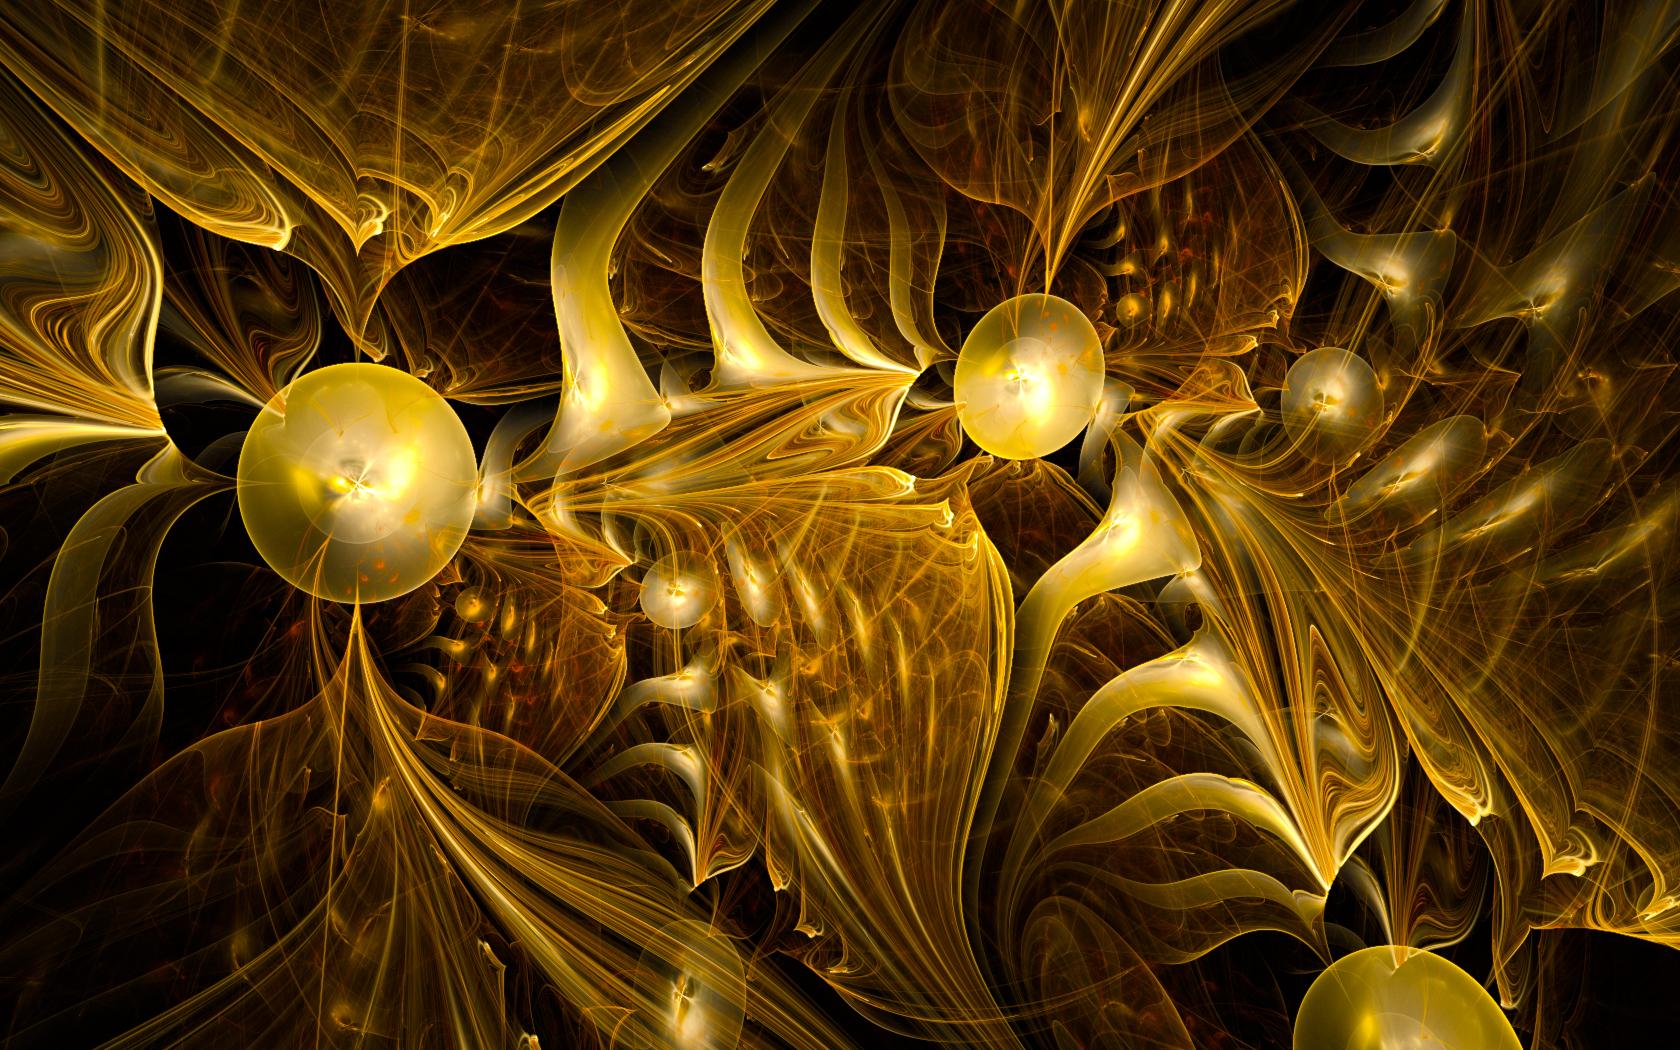 Gold Rush by Anyzamarah 1680x1050